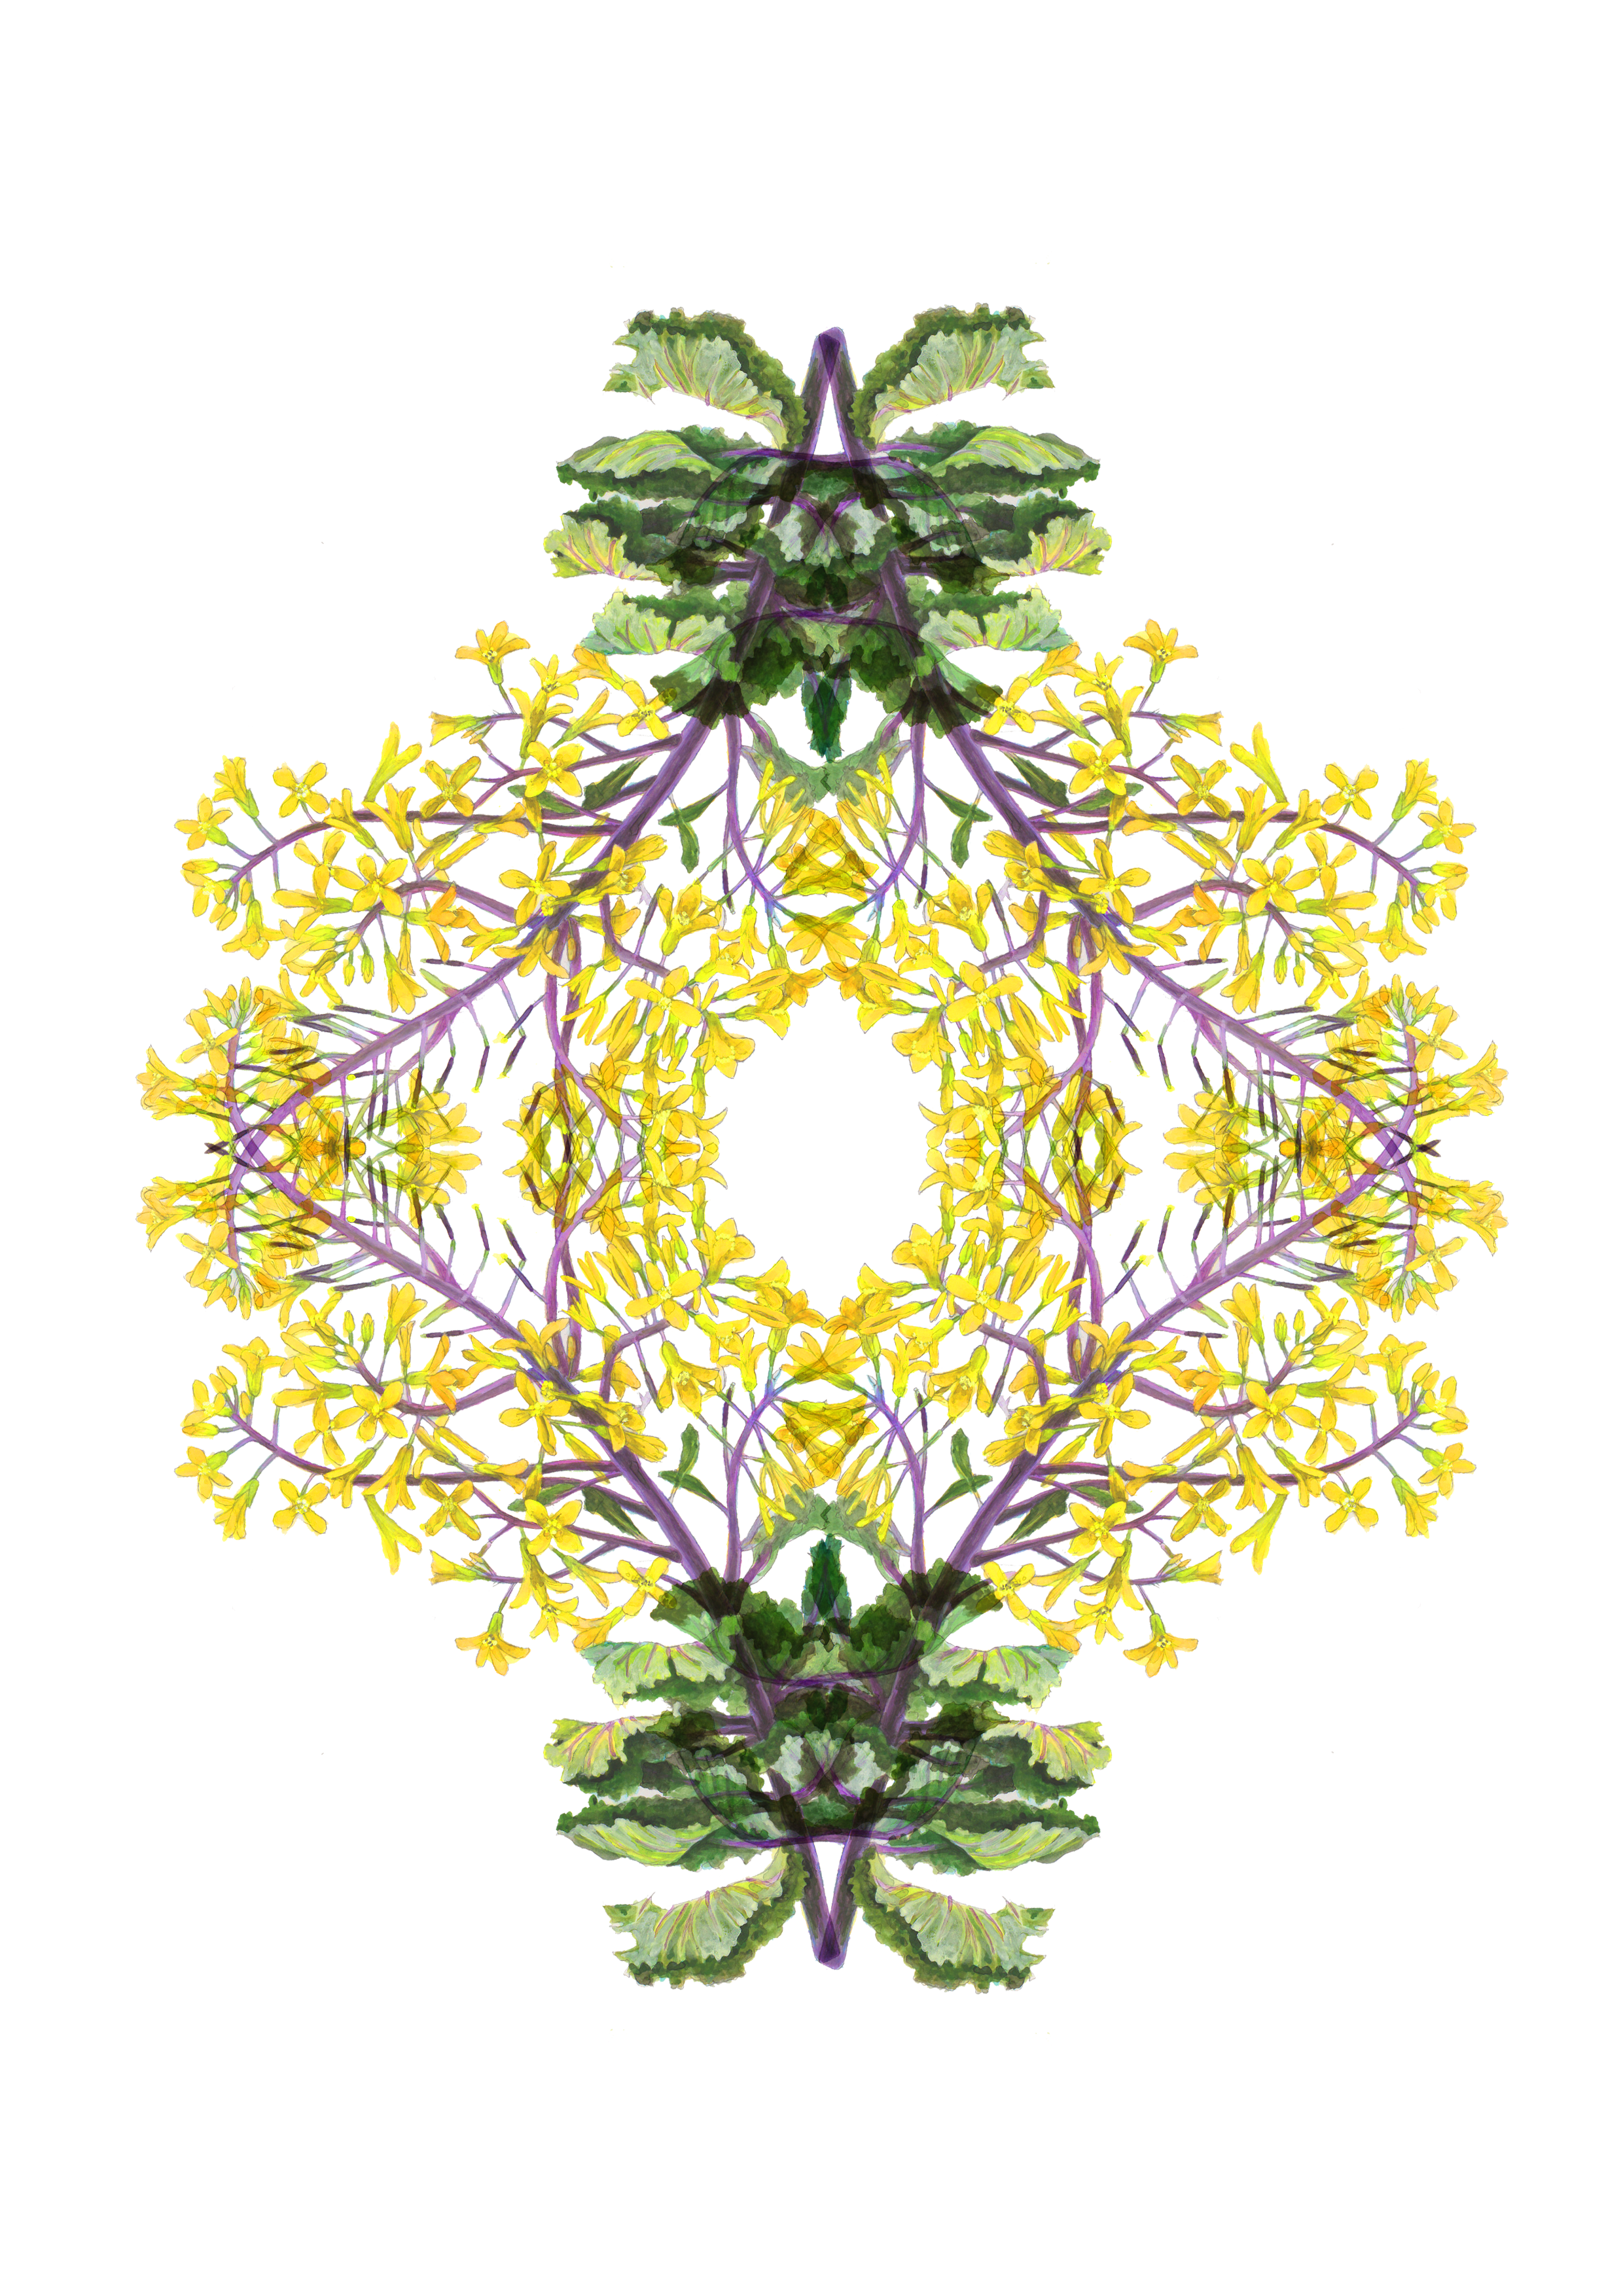 plants60